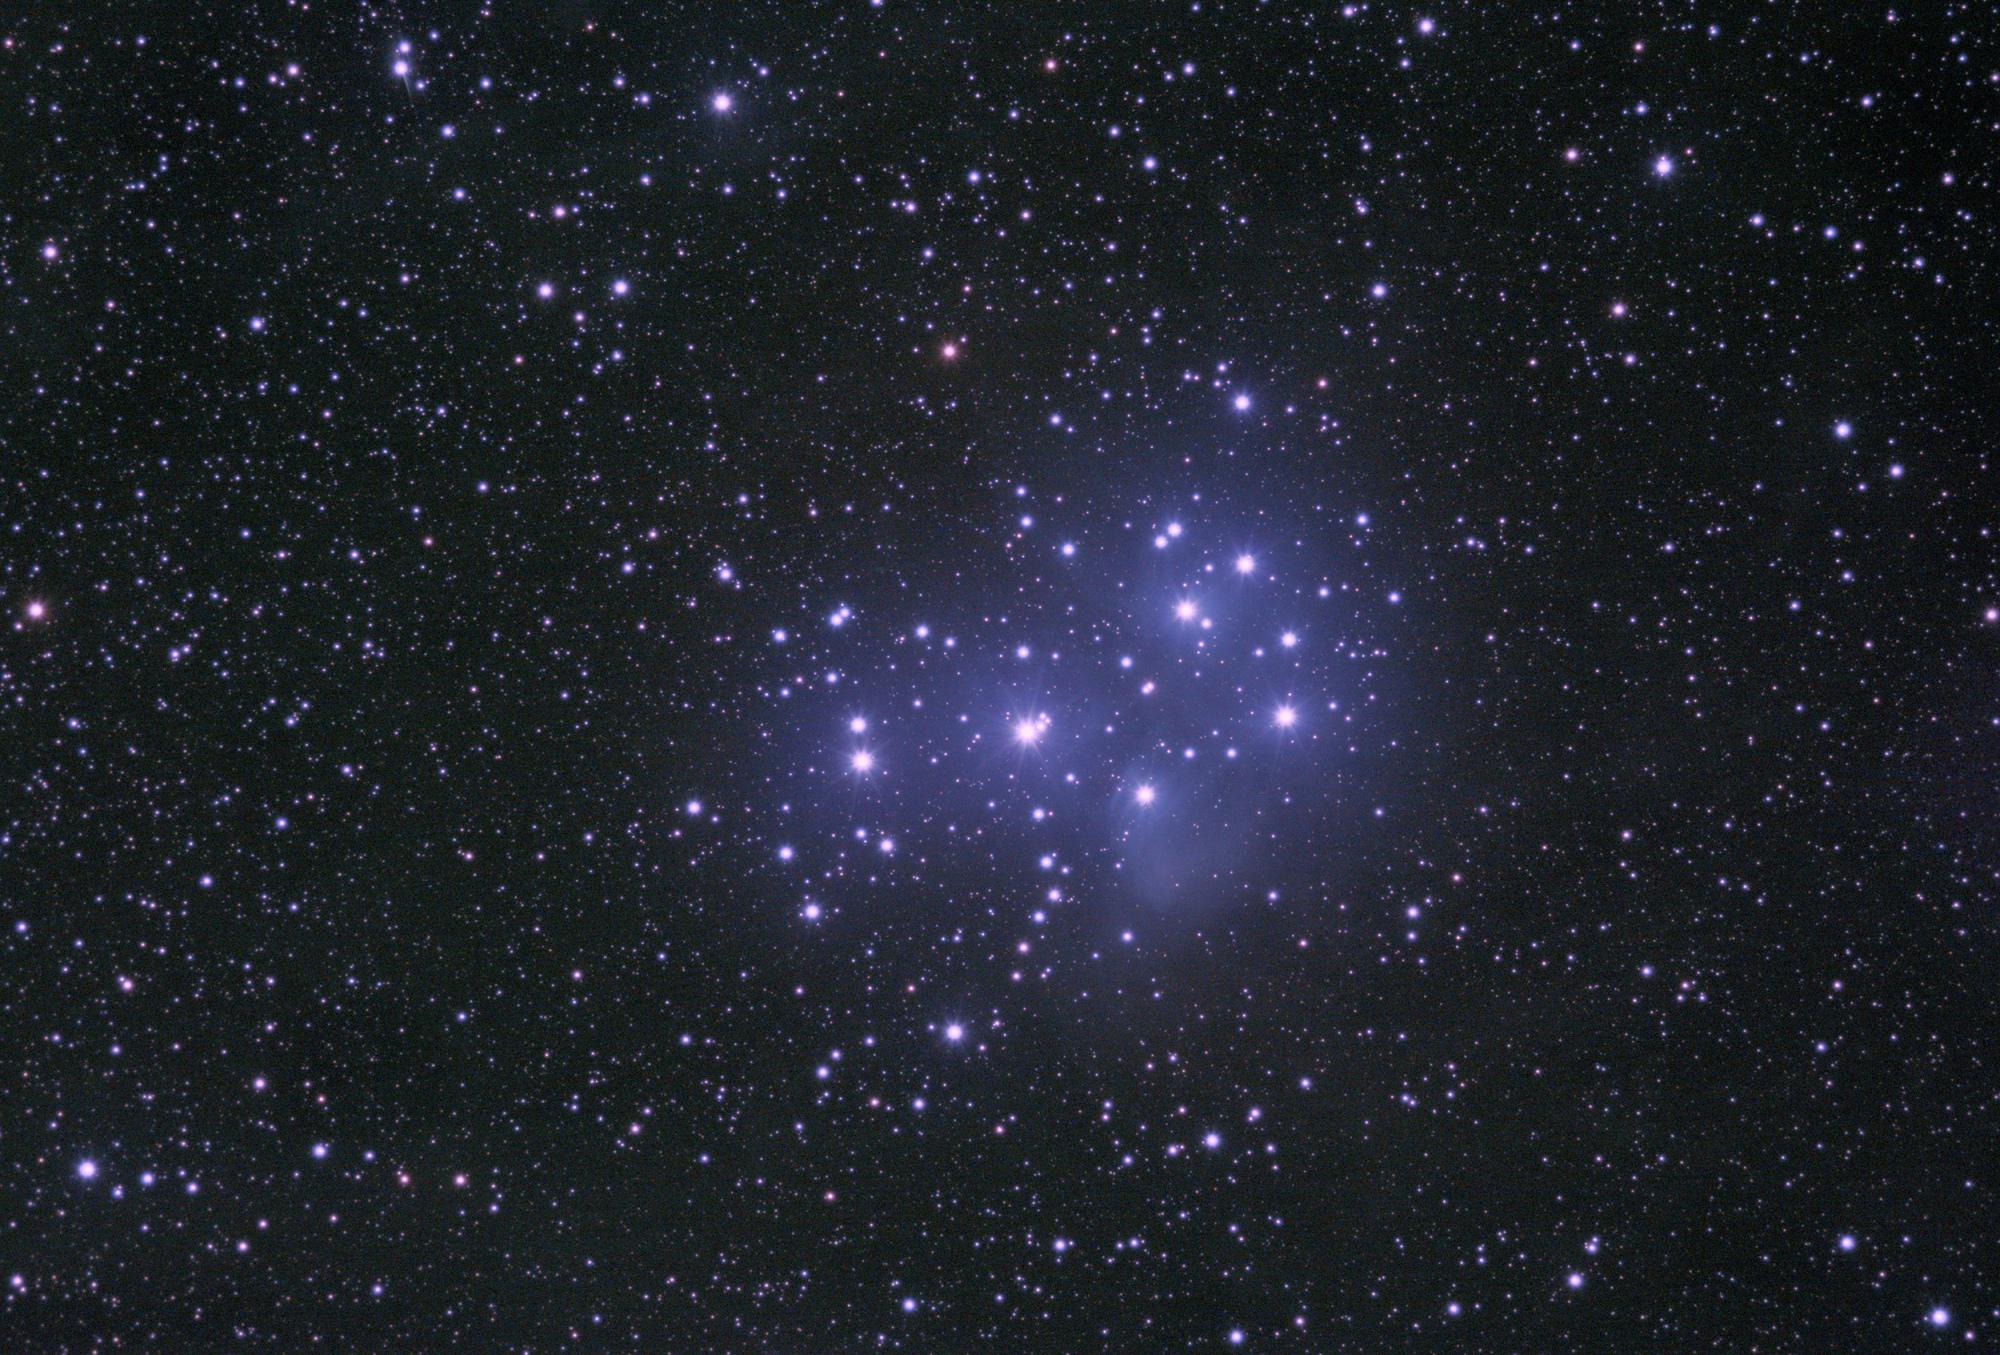 PleiadesCompLRGB_v2.jpg